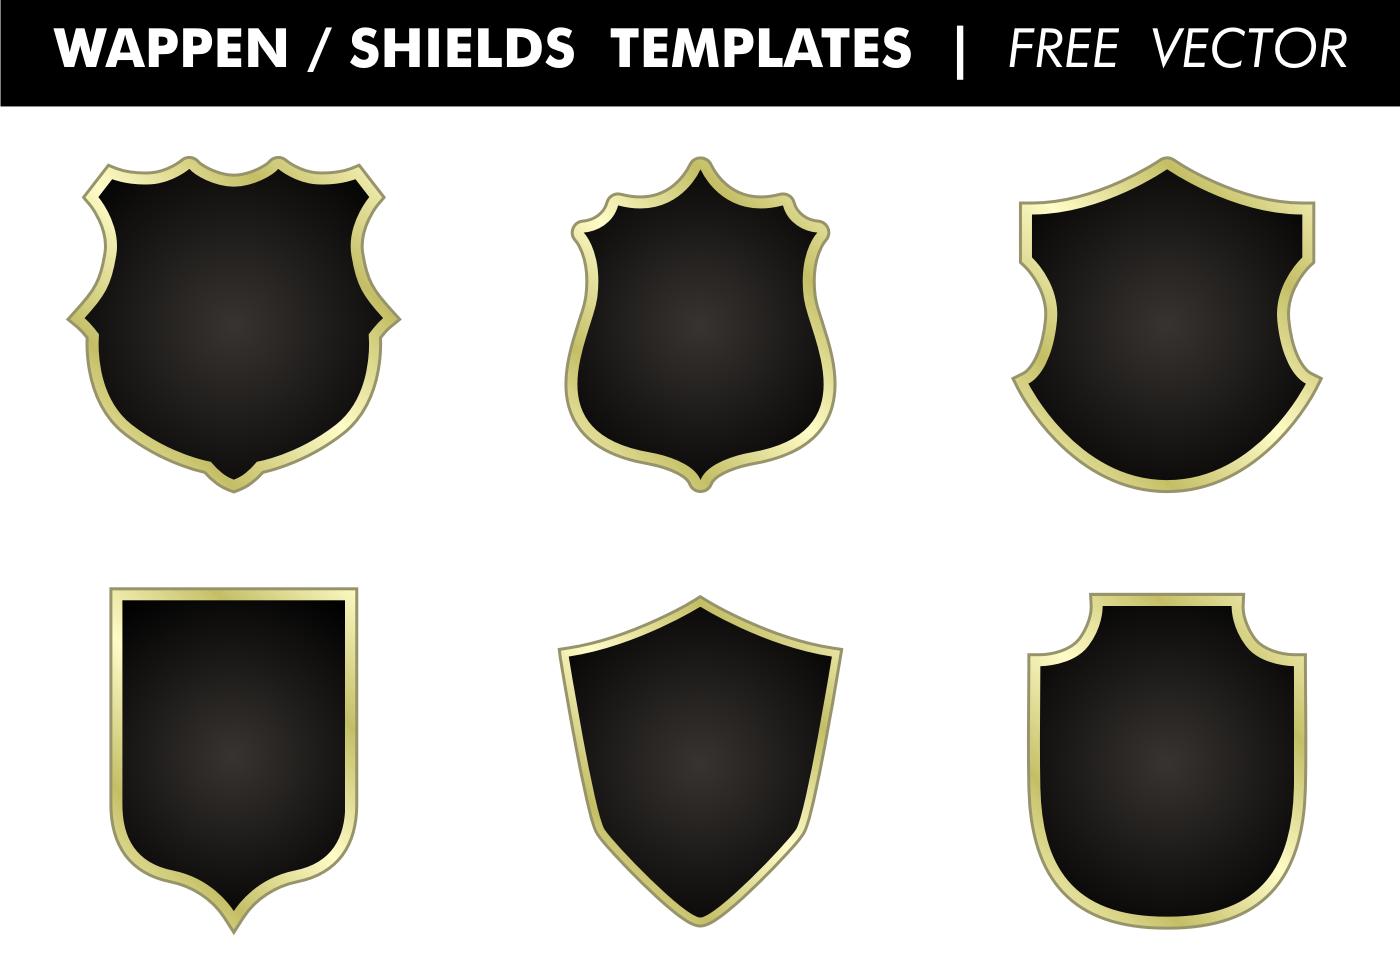 Wappen & Shields Templates Vector - Download Free Vector Art, Stock ...